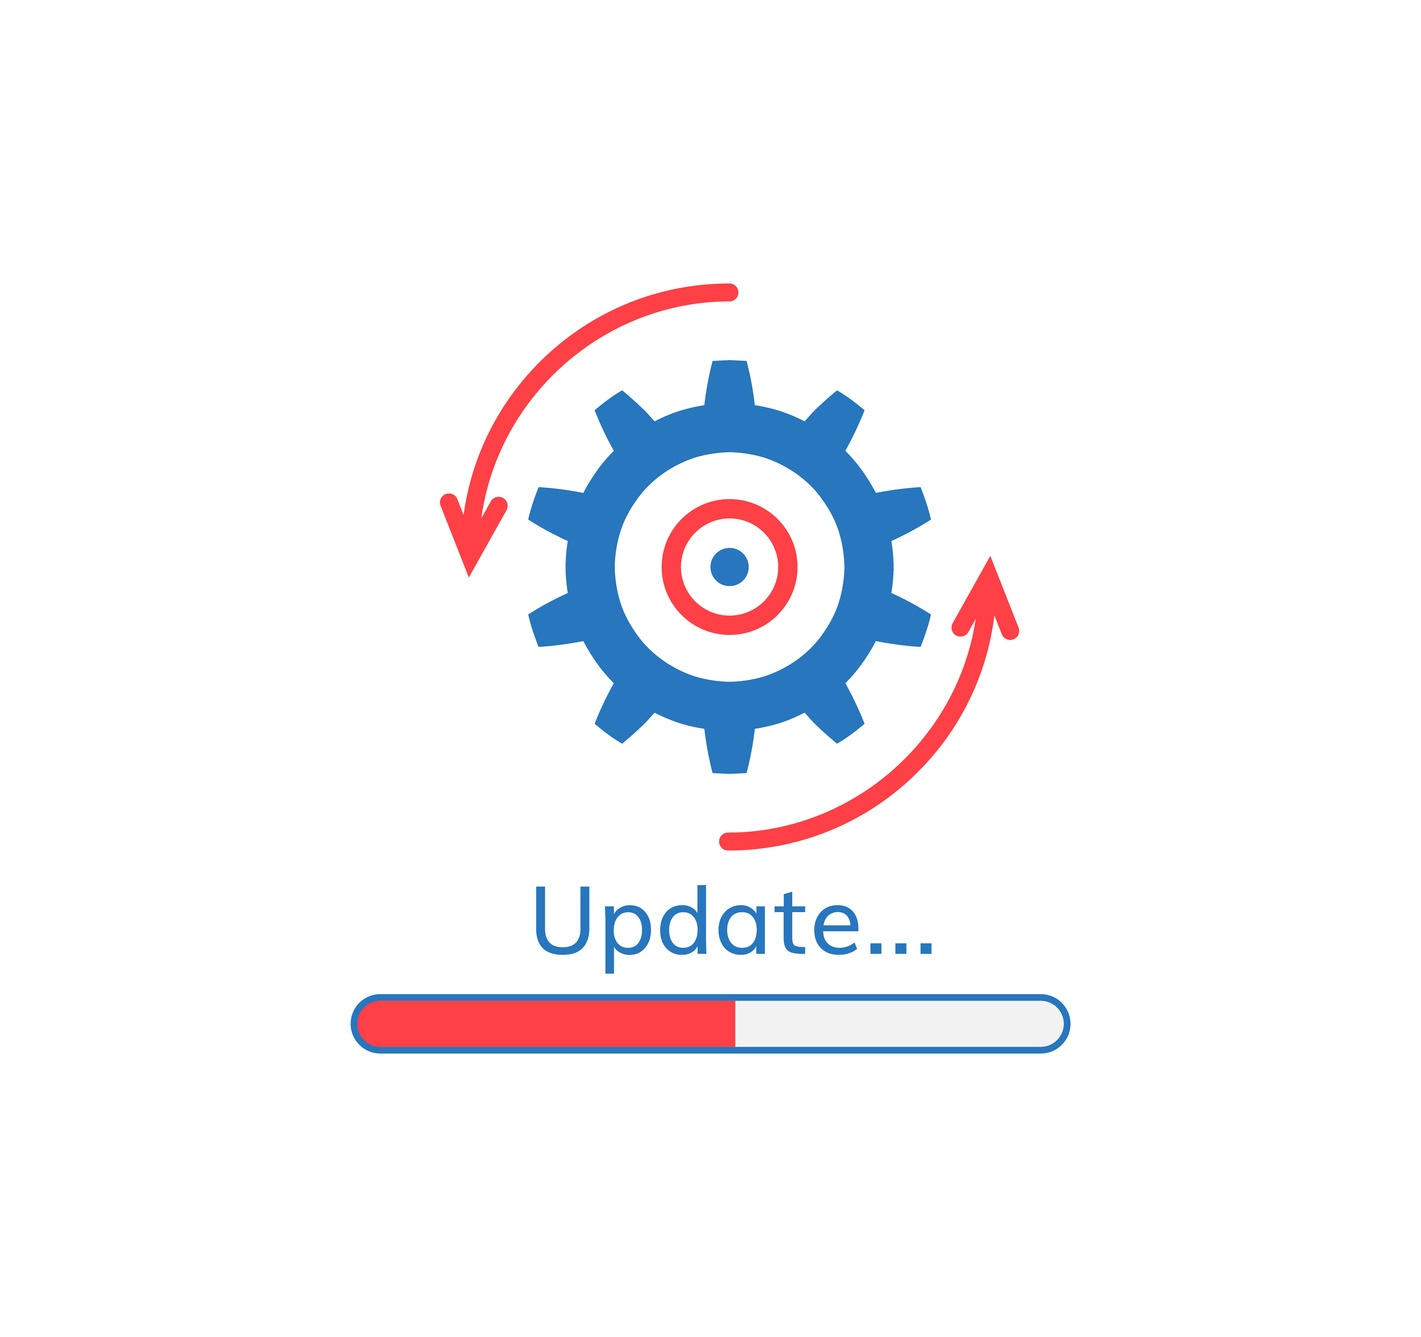 arcs january 2018 update